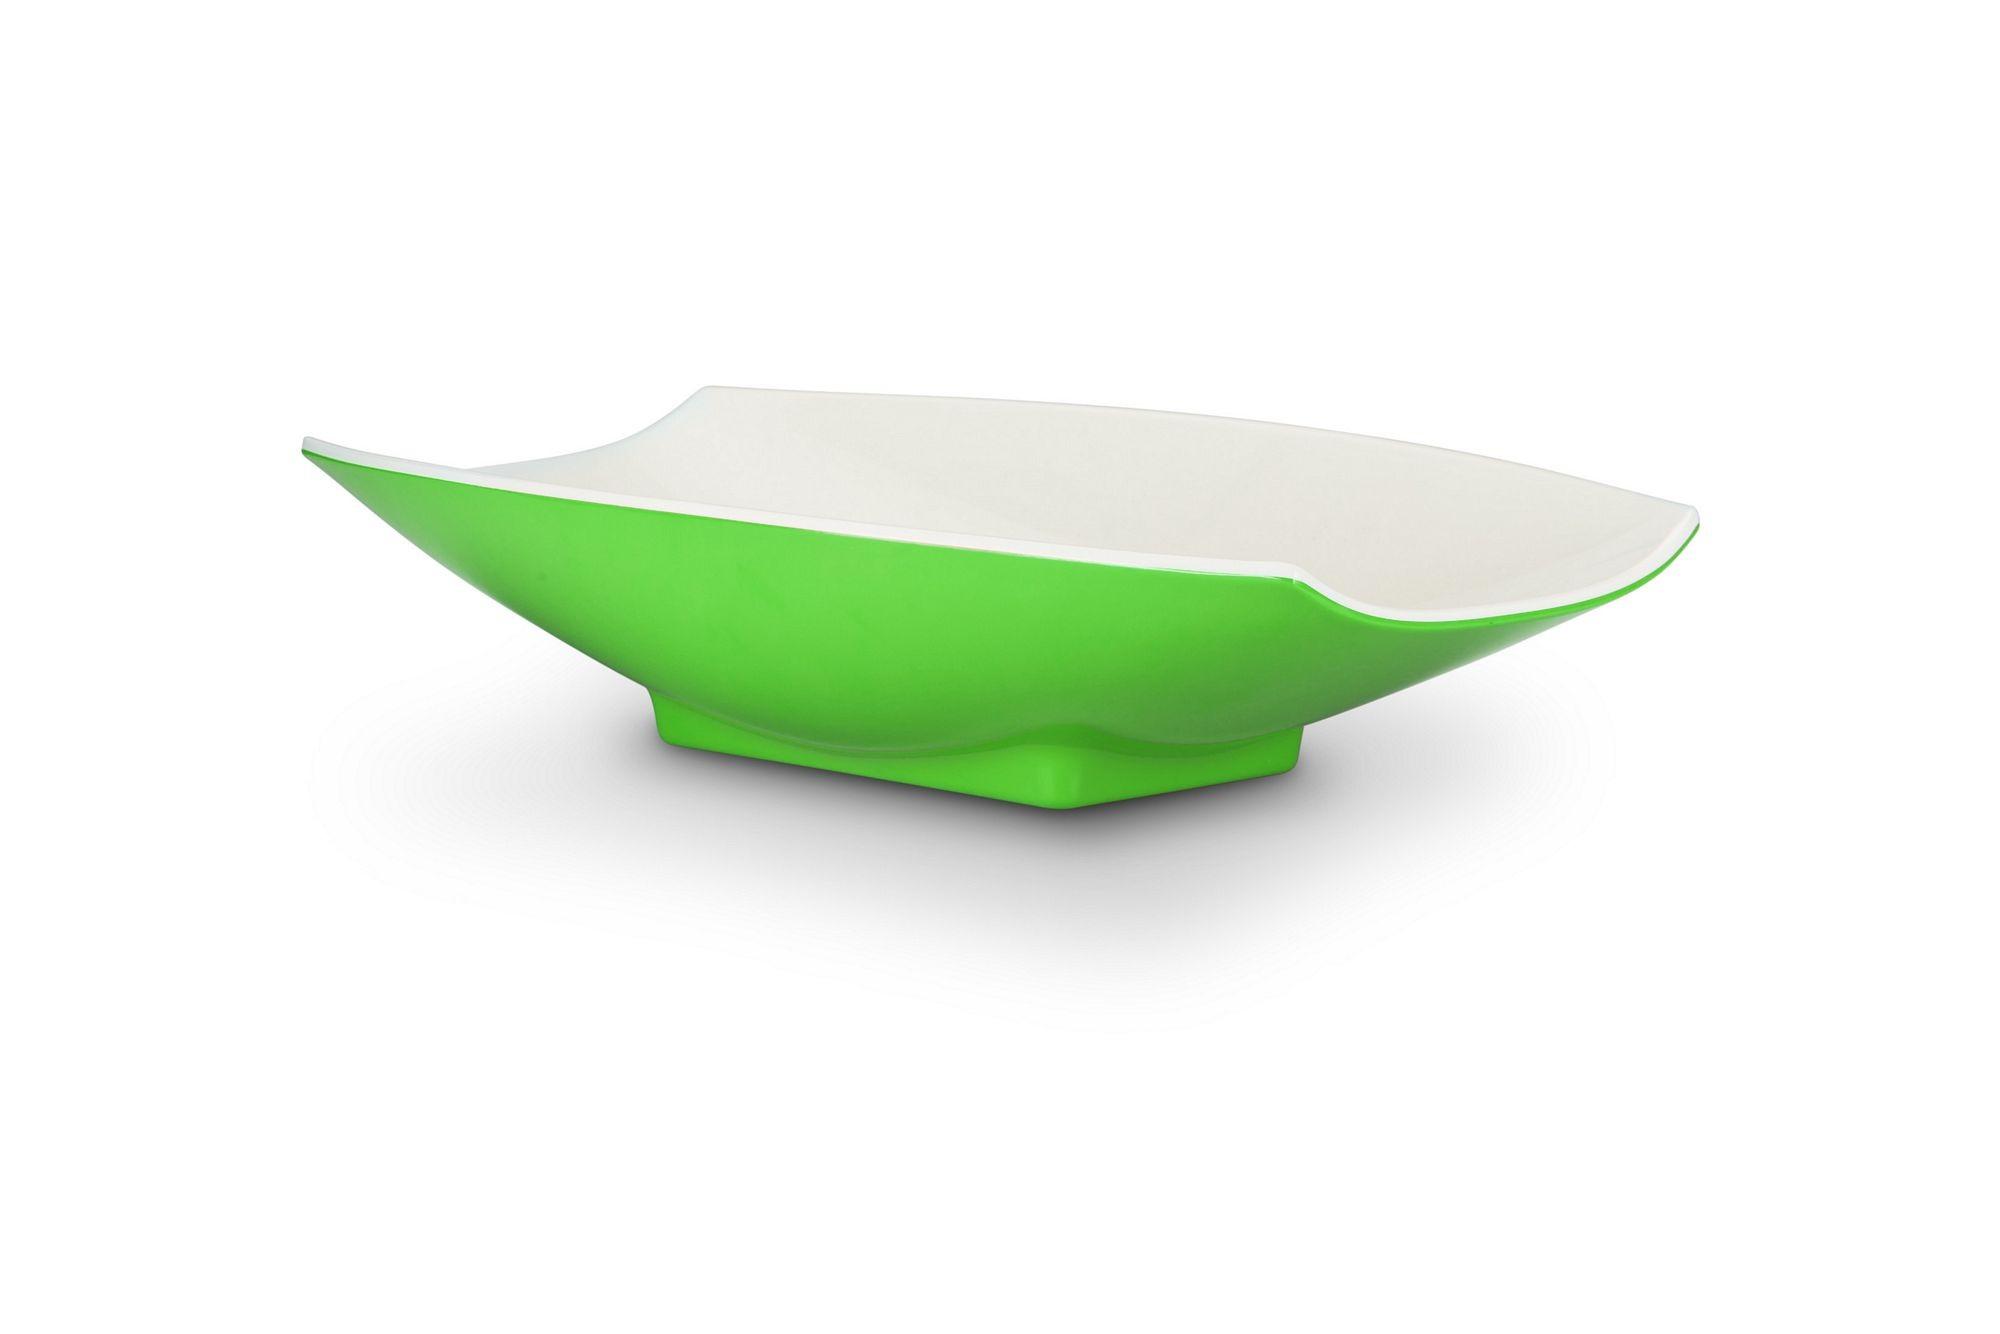 Bon Chef 53704-2ToneLime Melamine Curves Bowl, Lime Outside/White Inside 2 Qt.